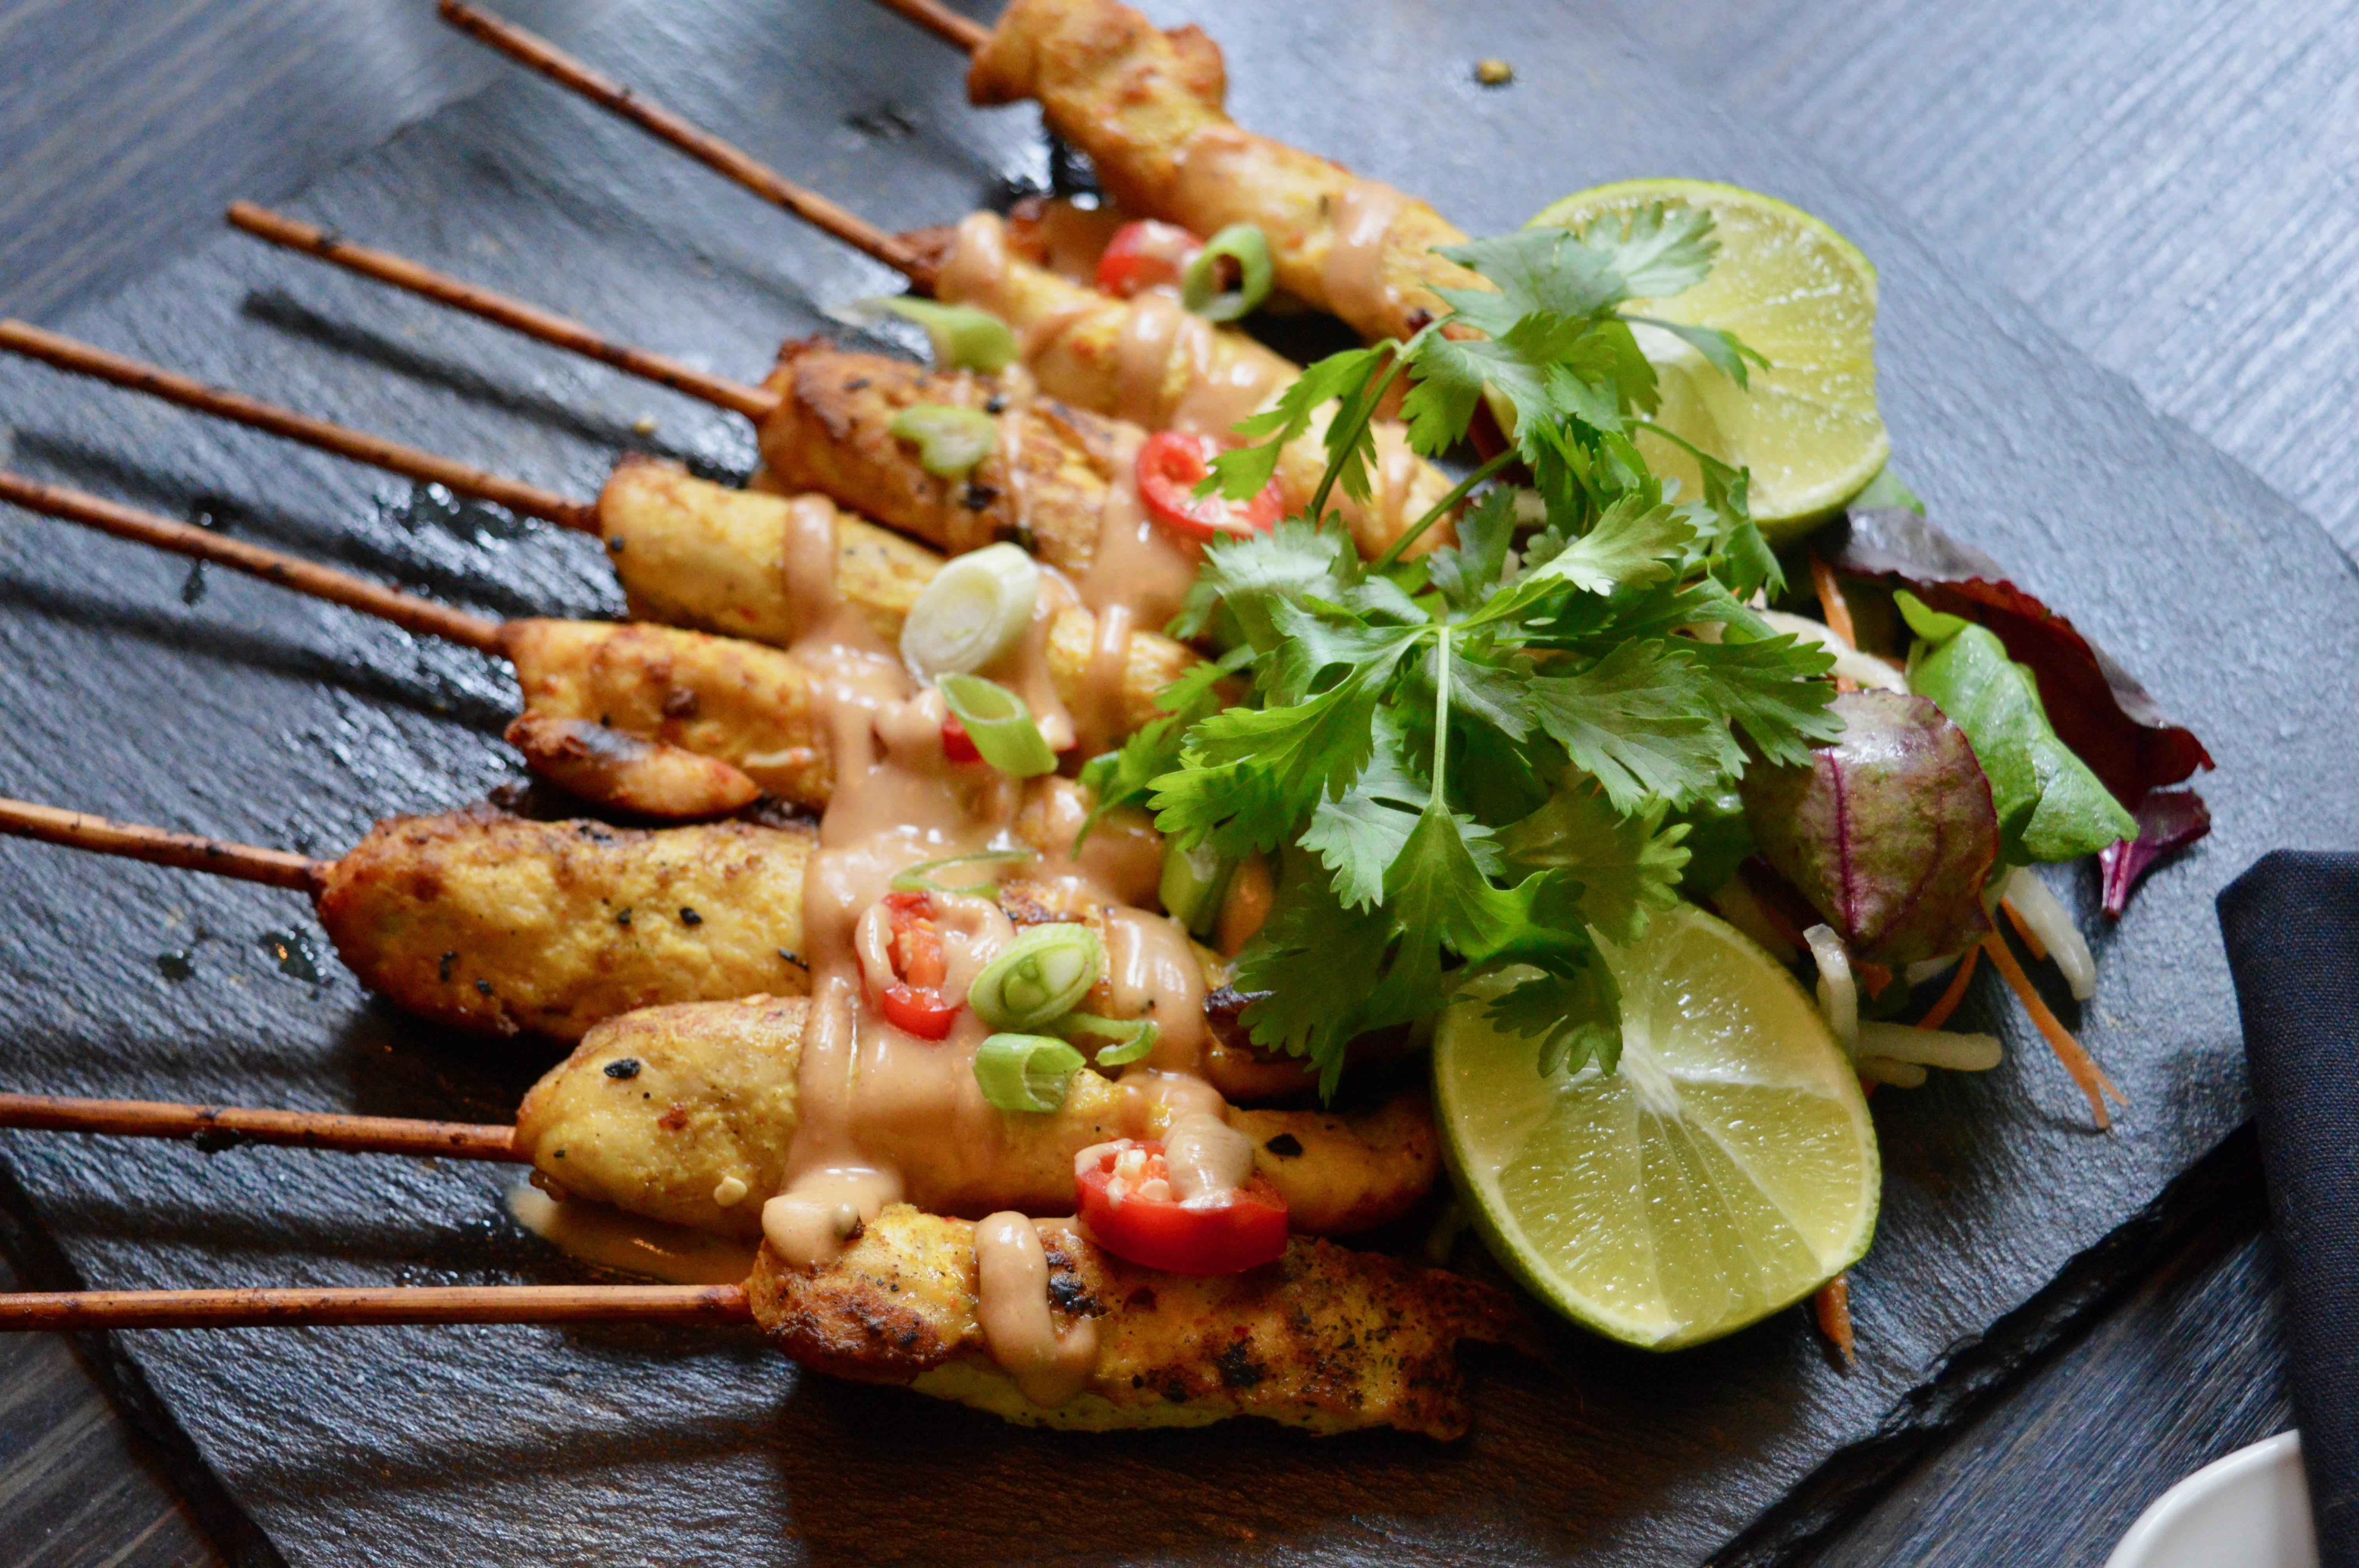 Chicken-Satay-Skewers-Food-Selection-SoHe-Cocktail-Bar-Asian-Restaurant-Jesmond-Newcastle-Elle-Blonde-Luxury-Lifestyle-Blog